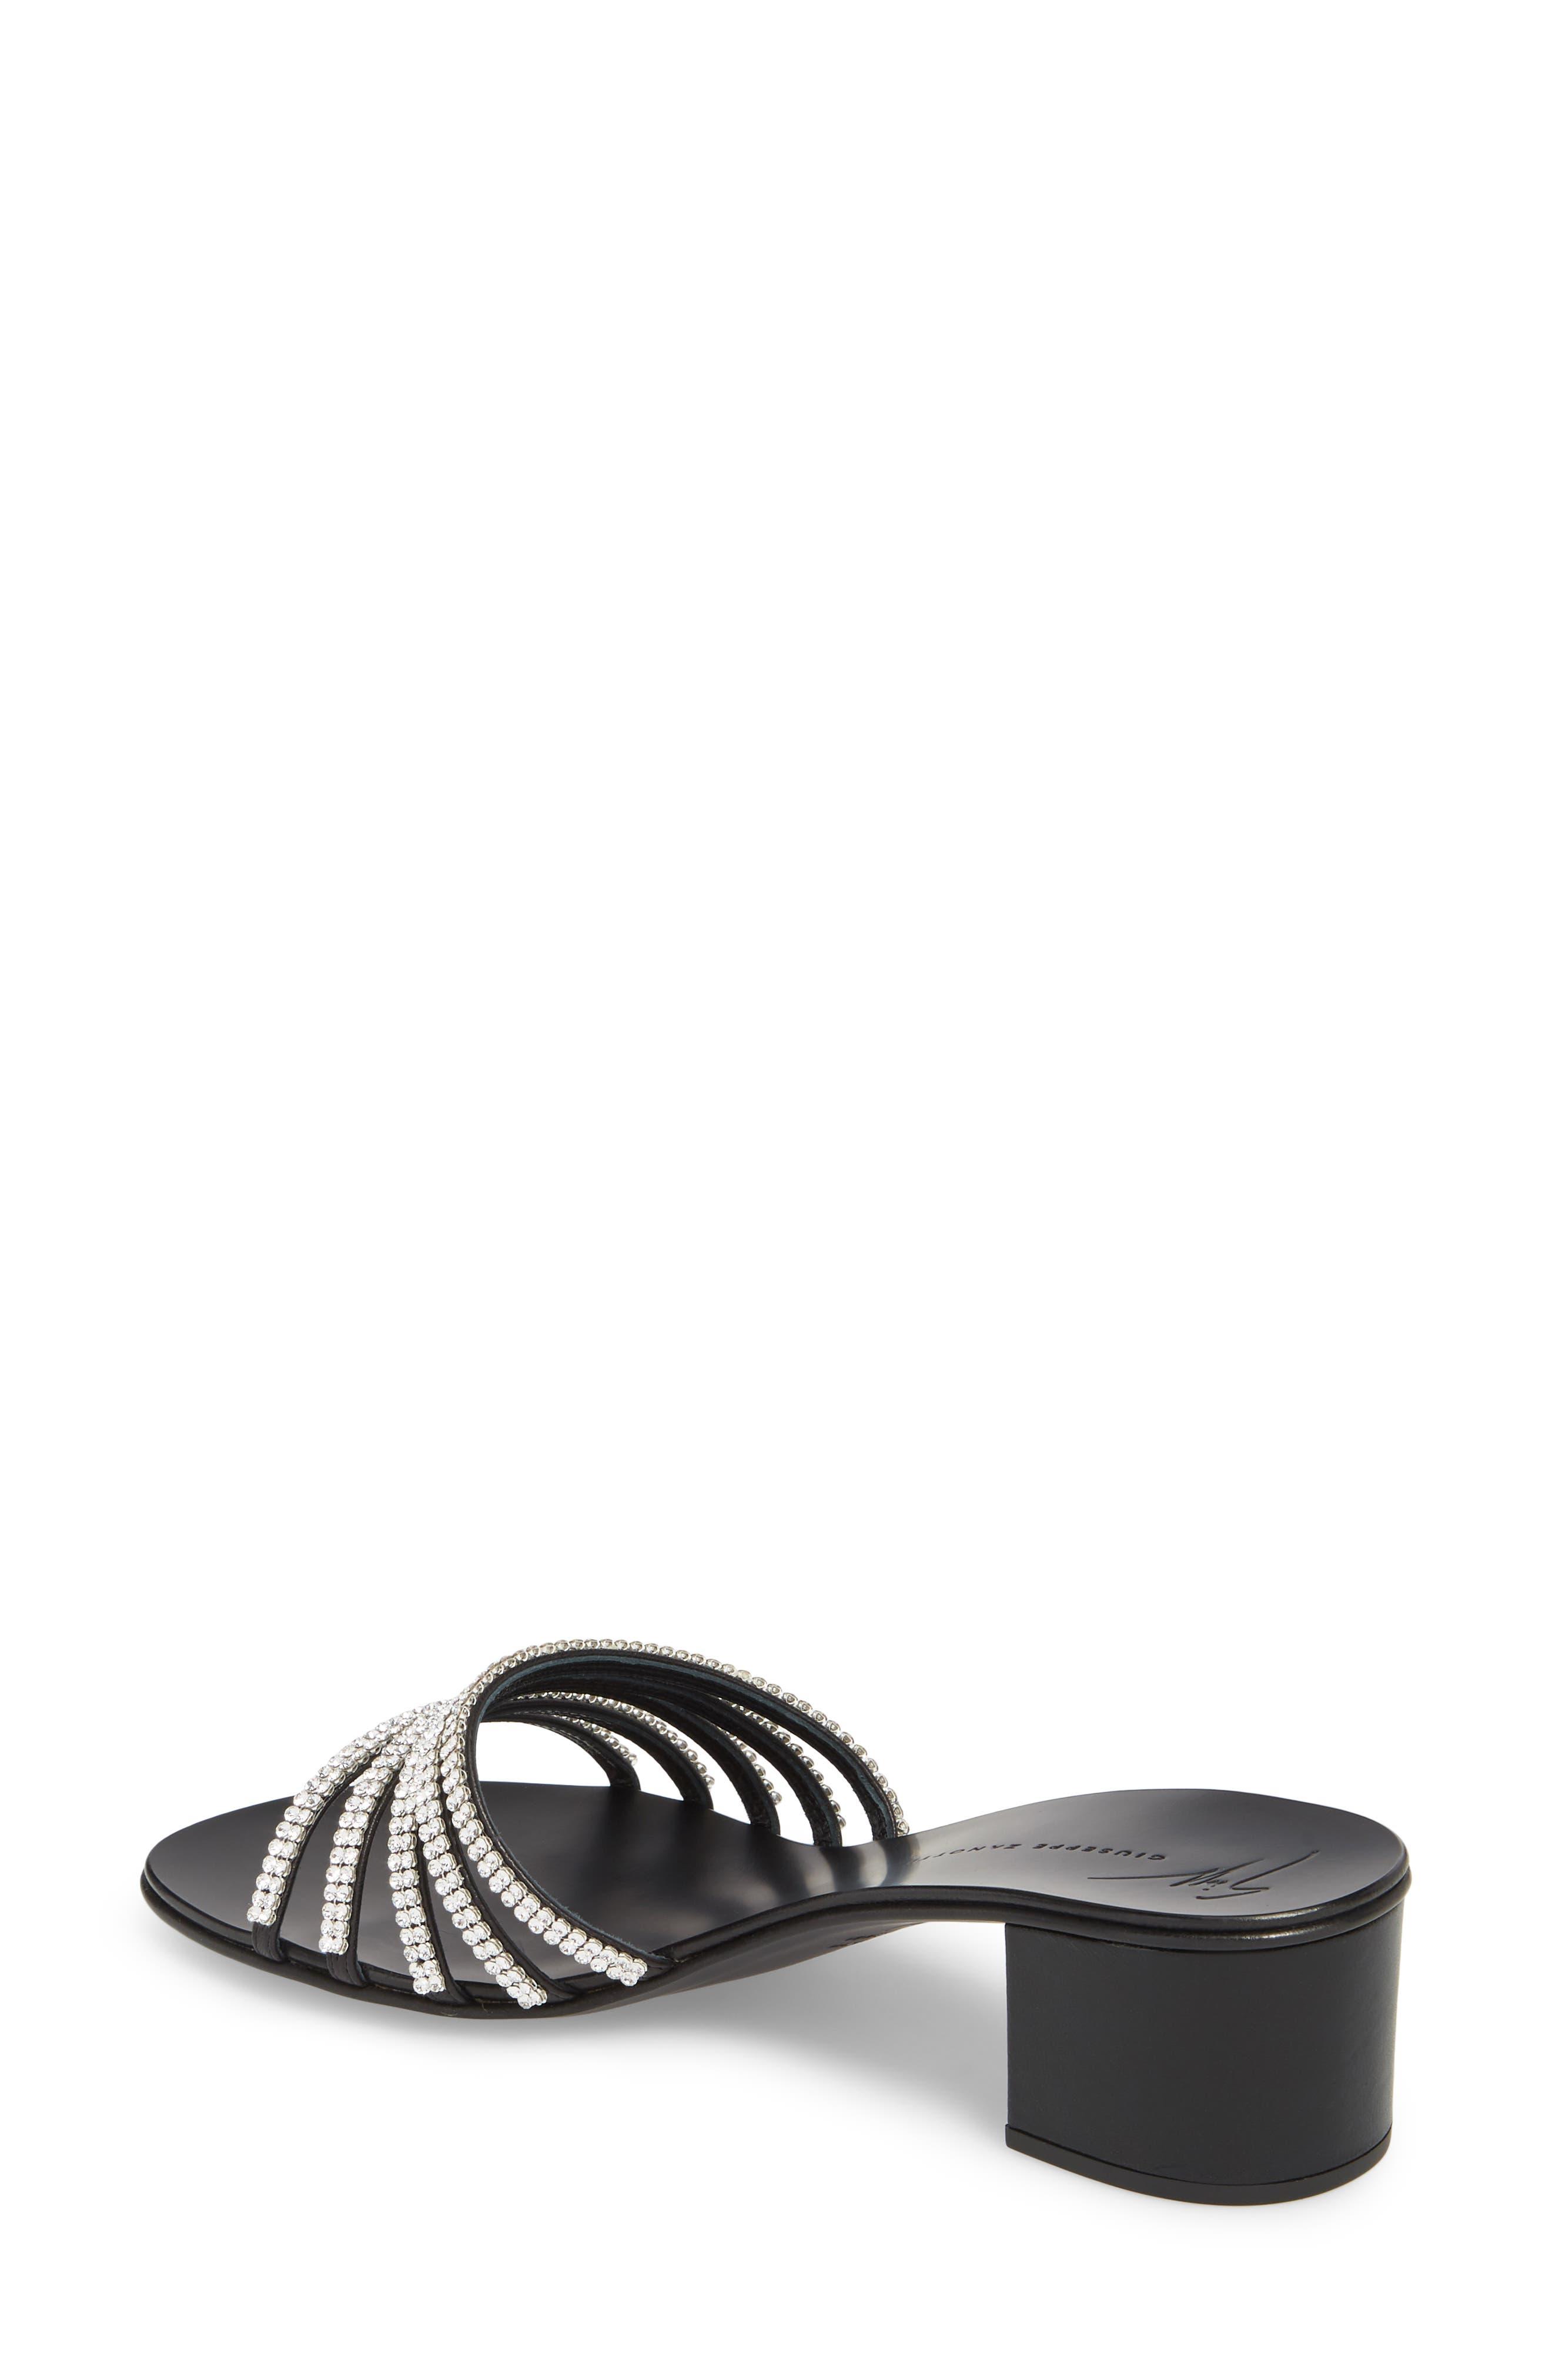 Swarovski Crystal Slide Sandal,                             Alternate thumbnail 2, color,                             BLACK